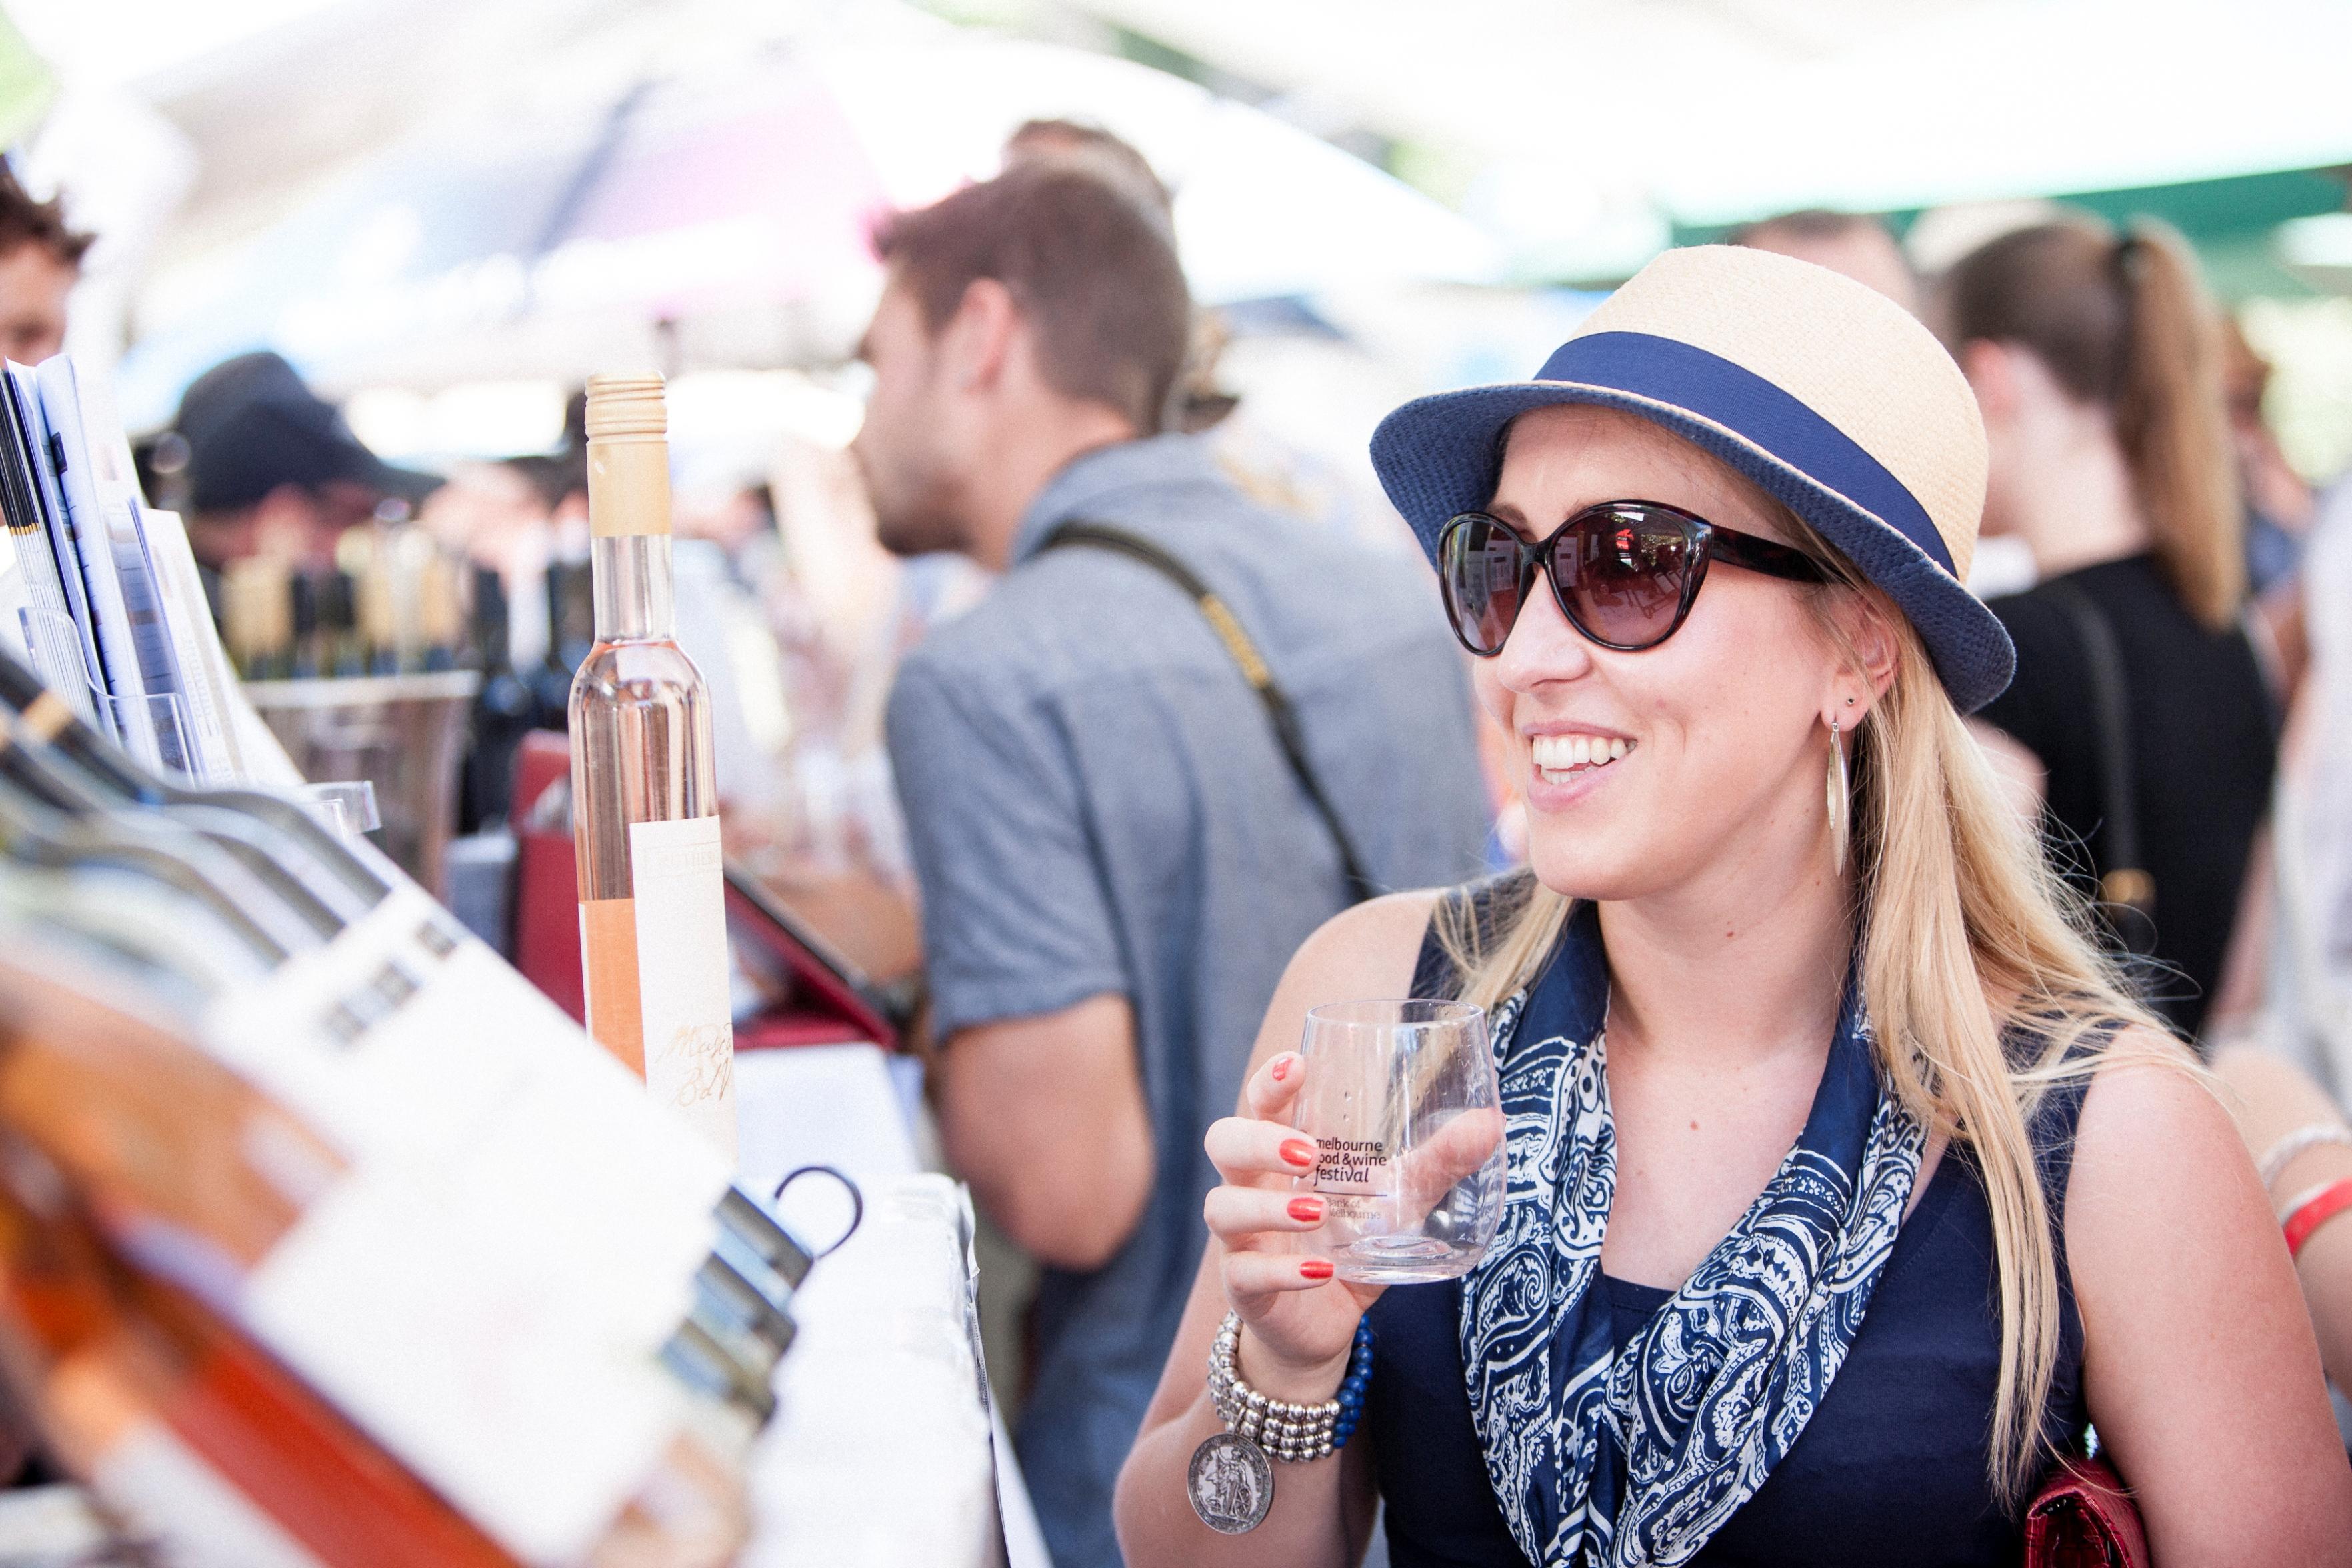 Melbourne Food & Wine Festival 2014. Image credit: Daniel Mahon